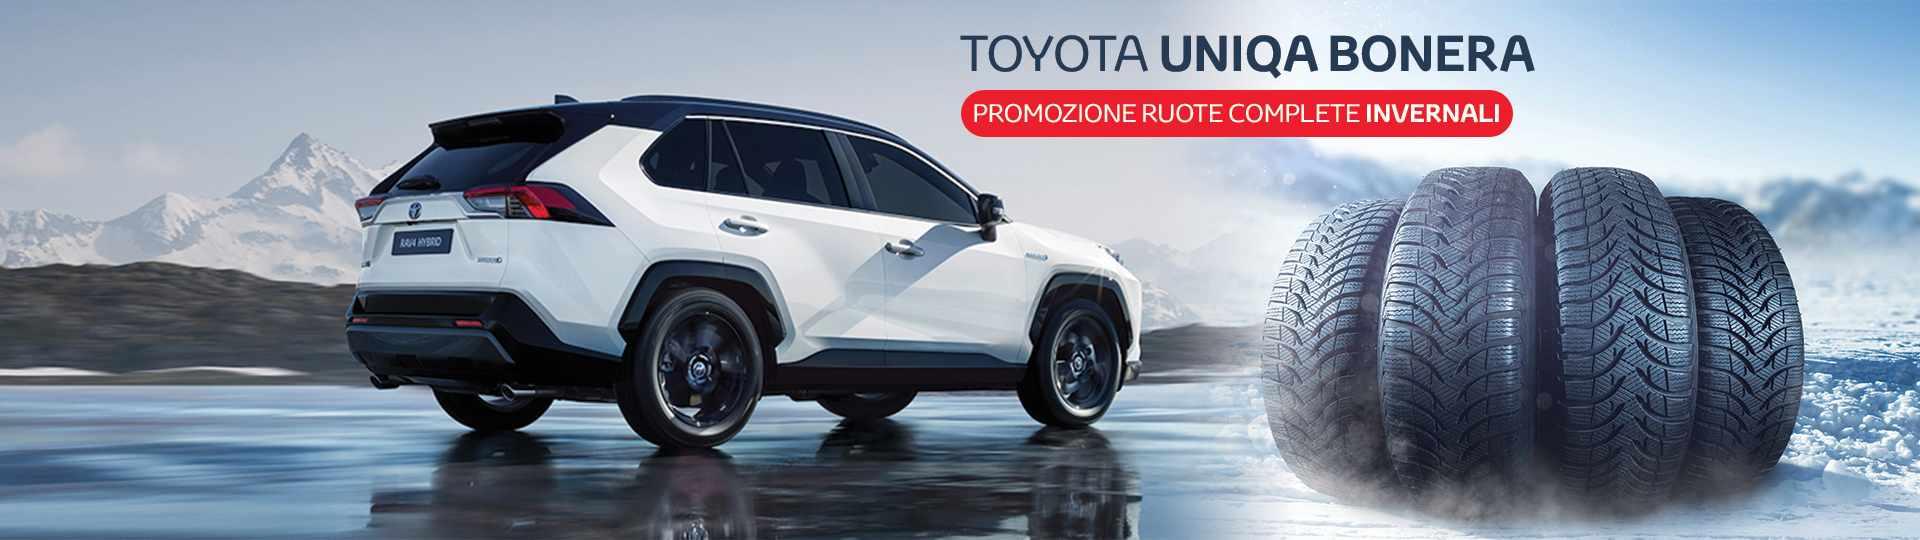 Header_Toyota_Ruote_Complete_Invernali_Ottobre_2020.jpg